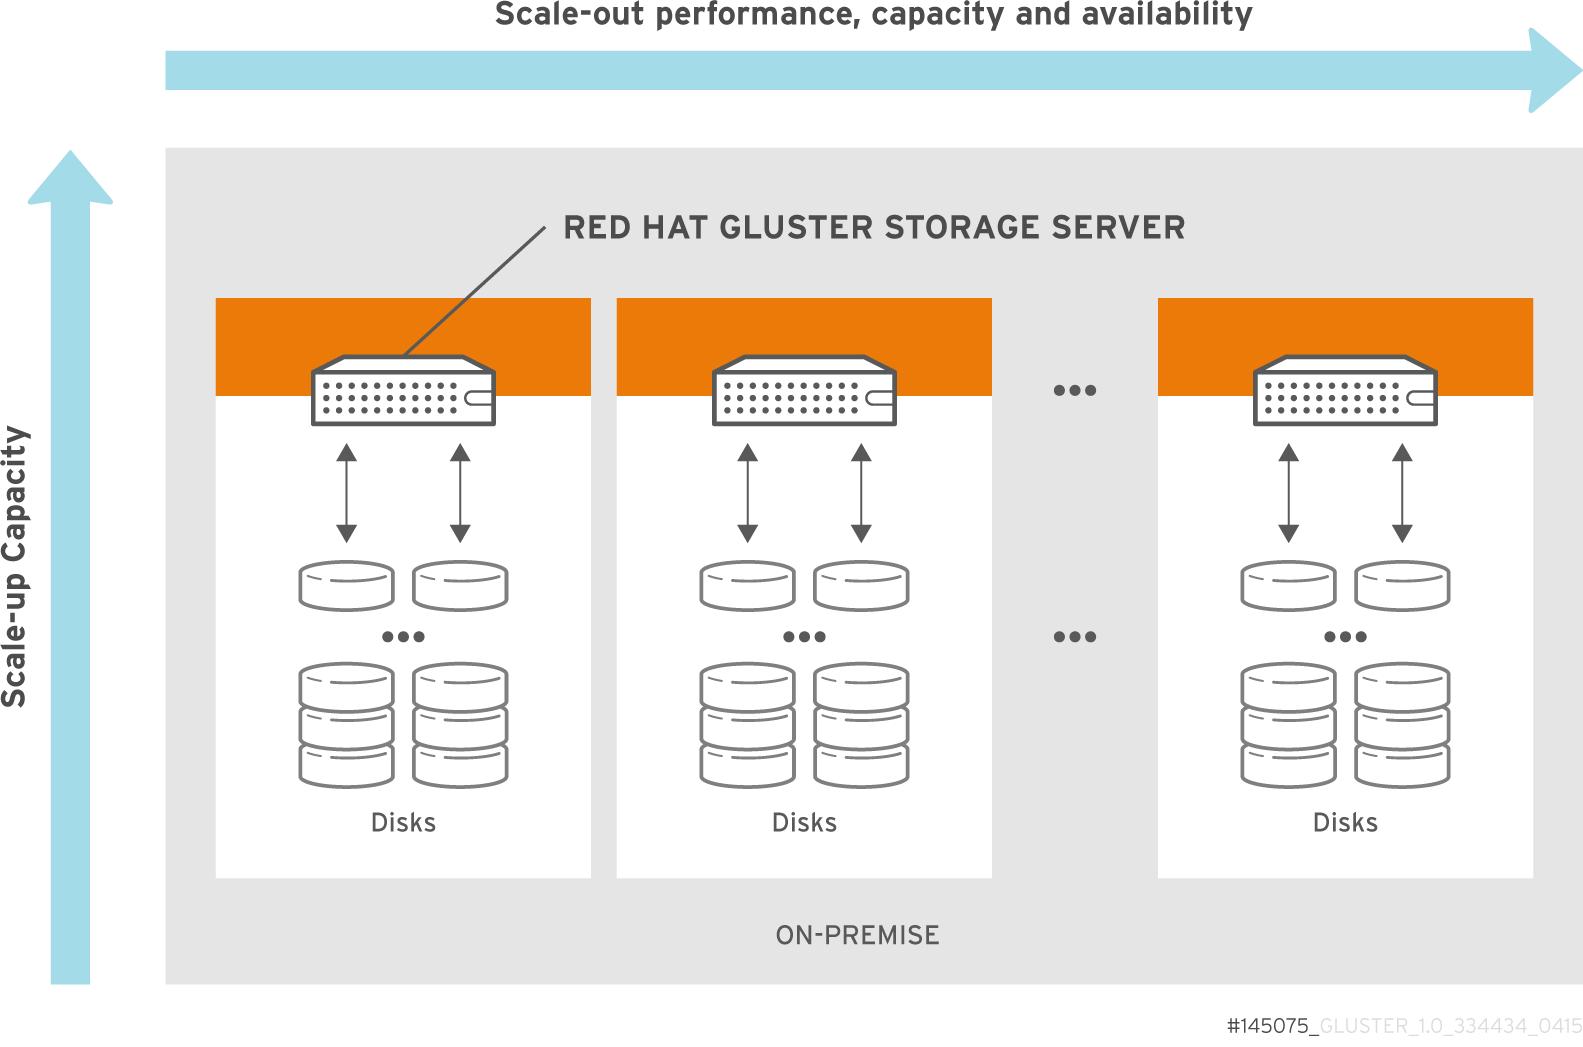 Red Hat Gluster Storage for On-premises アーキテクチャー